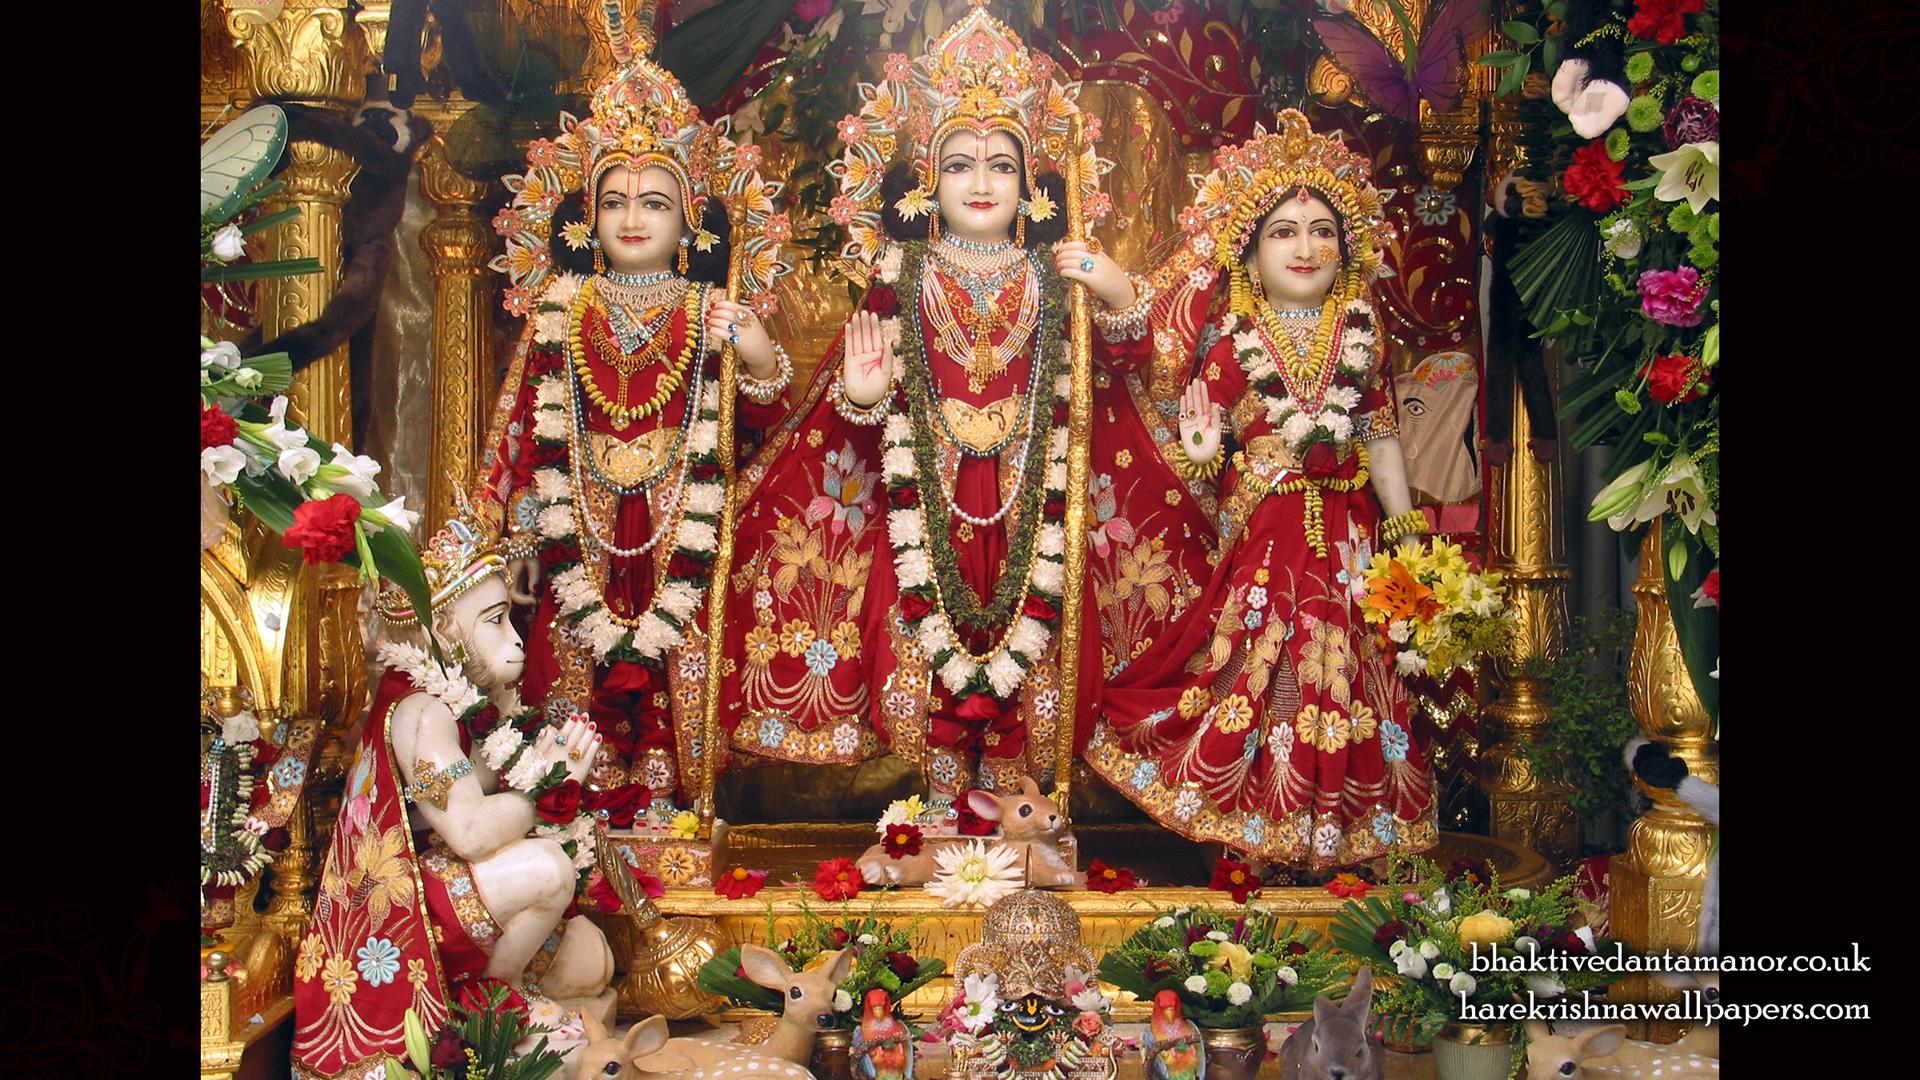 Sri Sri Sita Rama Laxman Hanuman Wallpaper (002) Size 1920x1080 Download